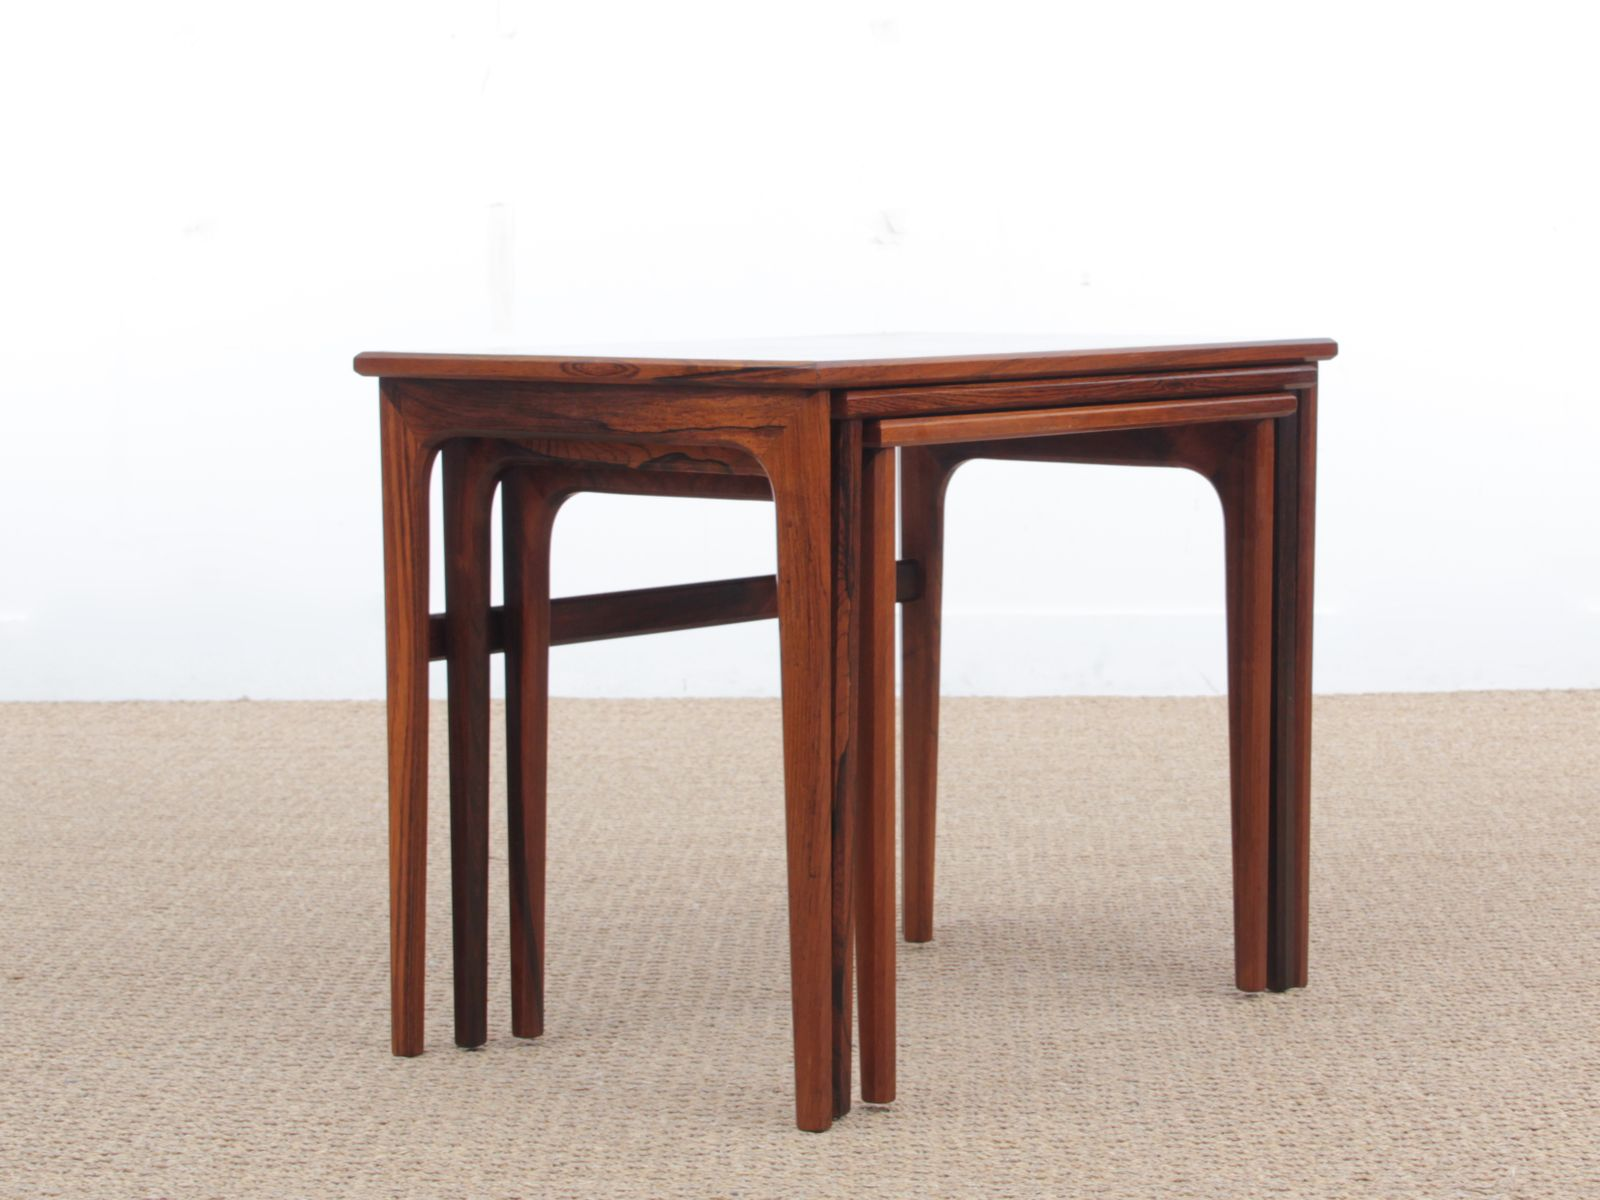 midcentury modern scandinavian nesting tables in rio rosewood s. midcentury modern scandinavian nesting tables in rio rosewood